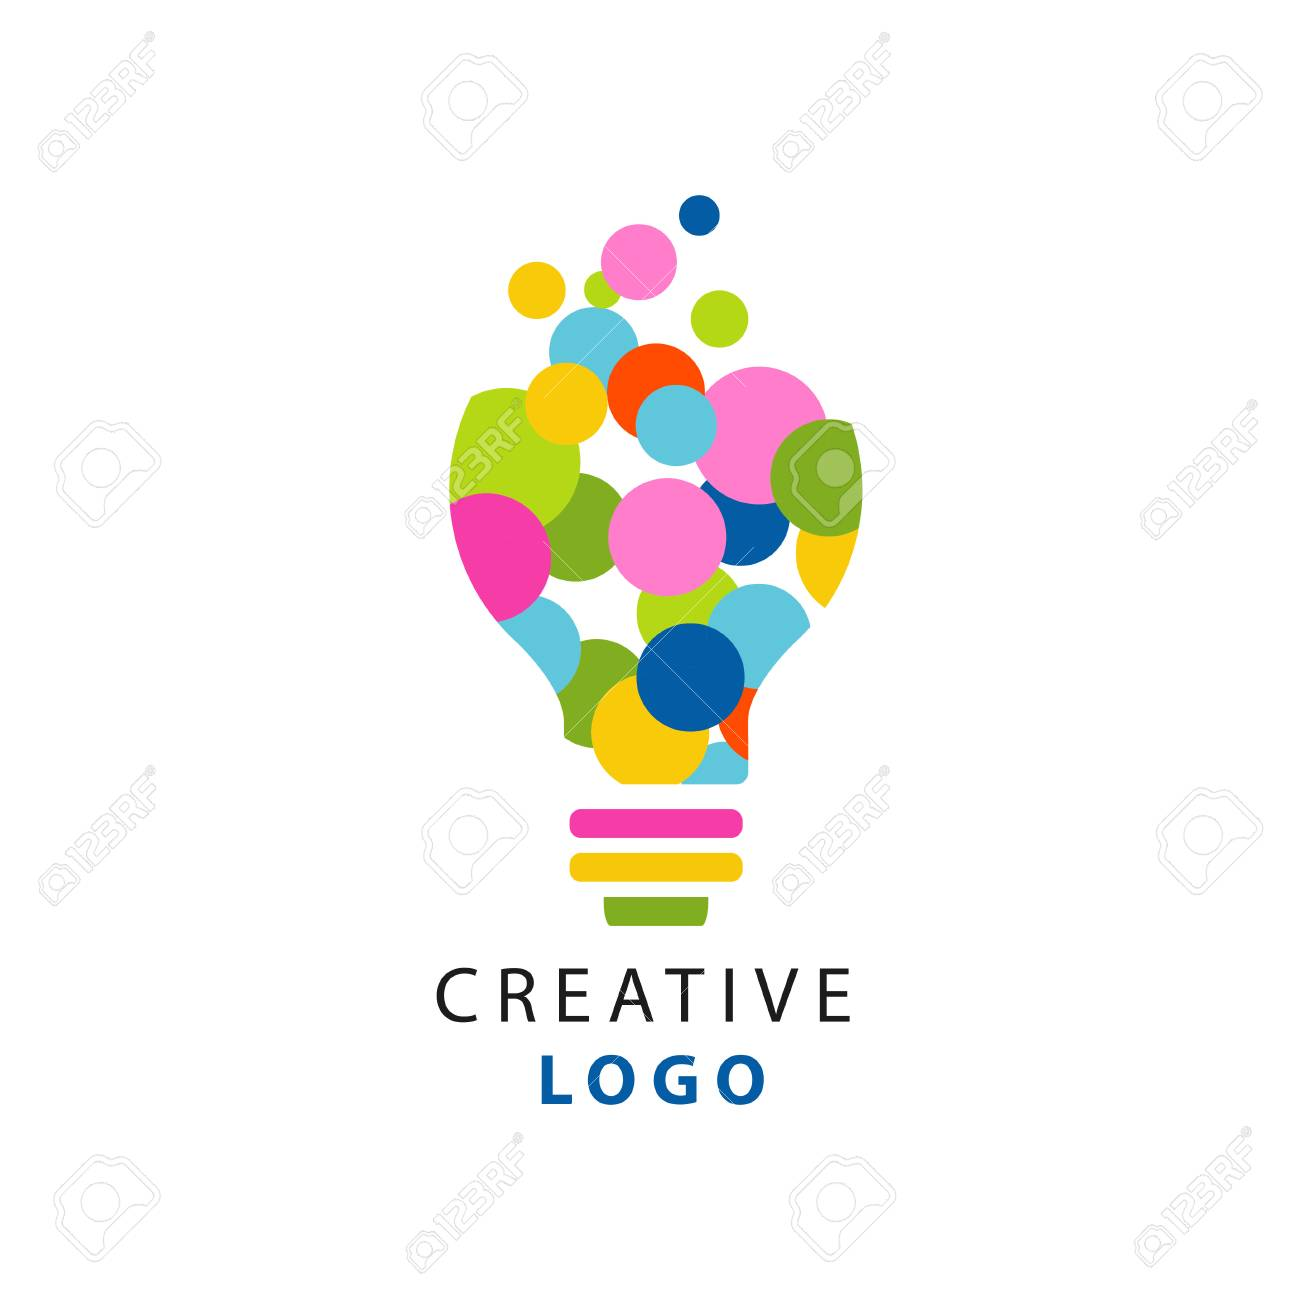 Original illustration of electric light bulb for creative idea logo. Children creativity and development center label. Flat vector isolated on white - 93128318